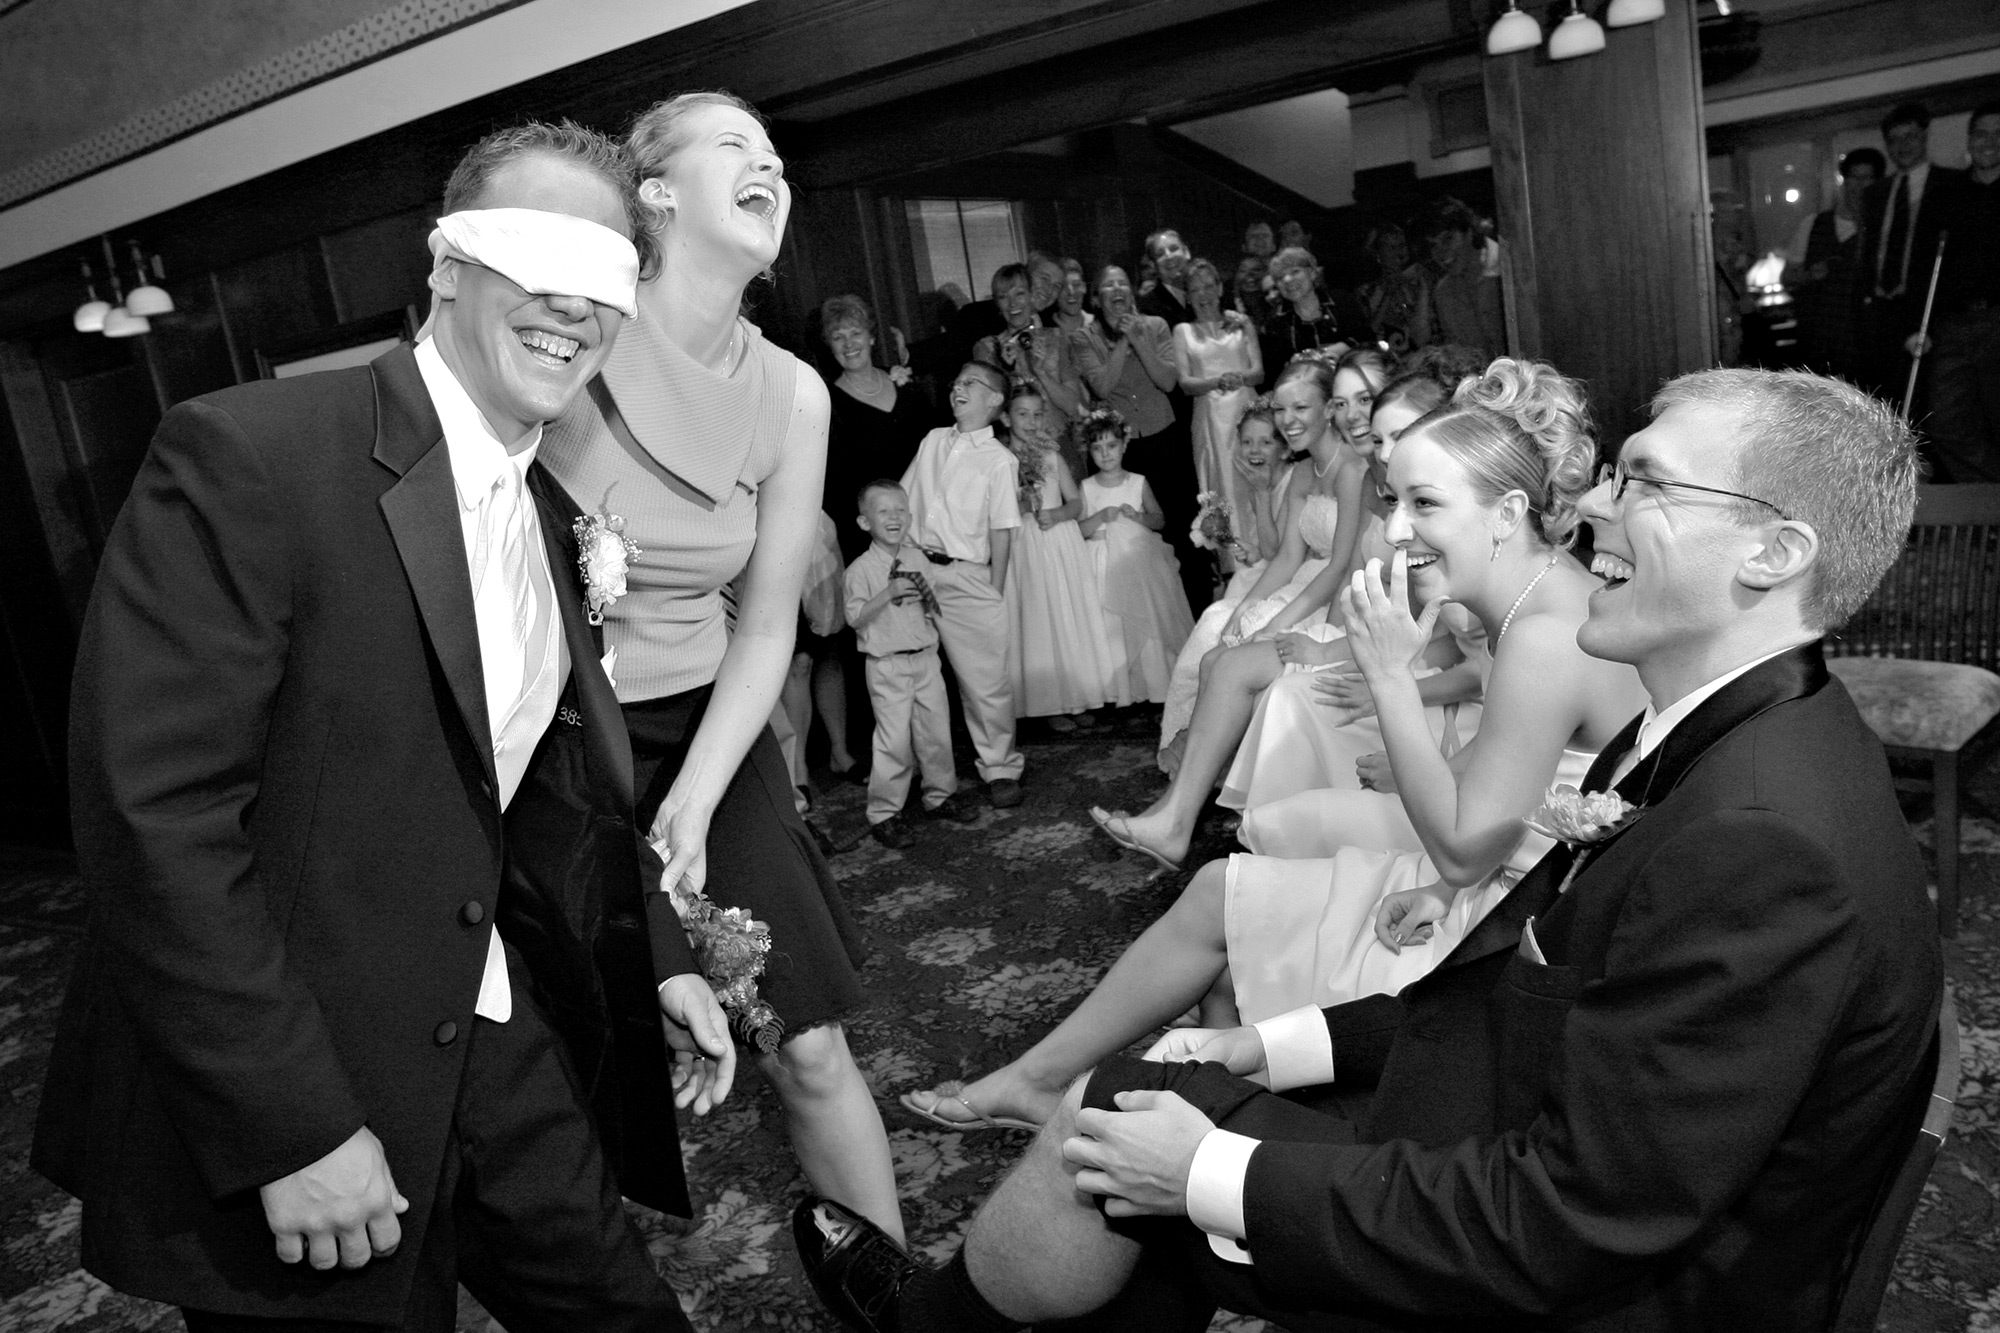 wedding-photography-saint-paul-mark-kegans-660.jpg